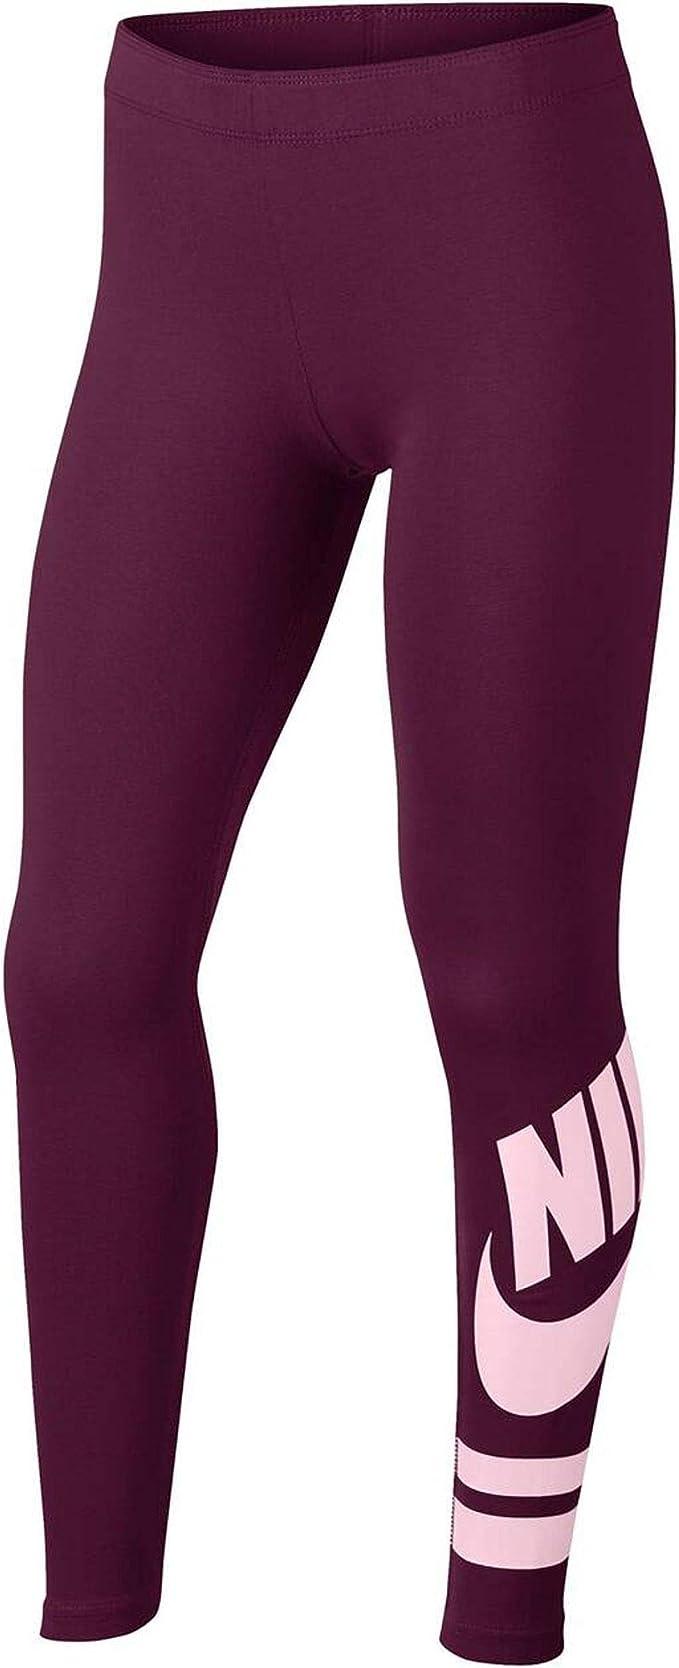 Nike Favorite Graphic Leggings Fille, BordeauxPink Foam, FR